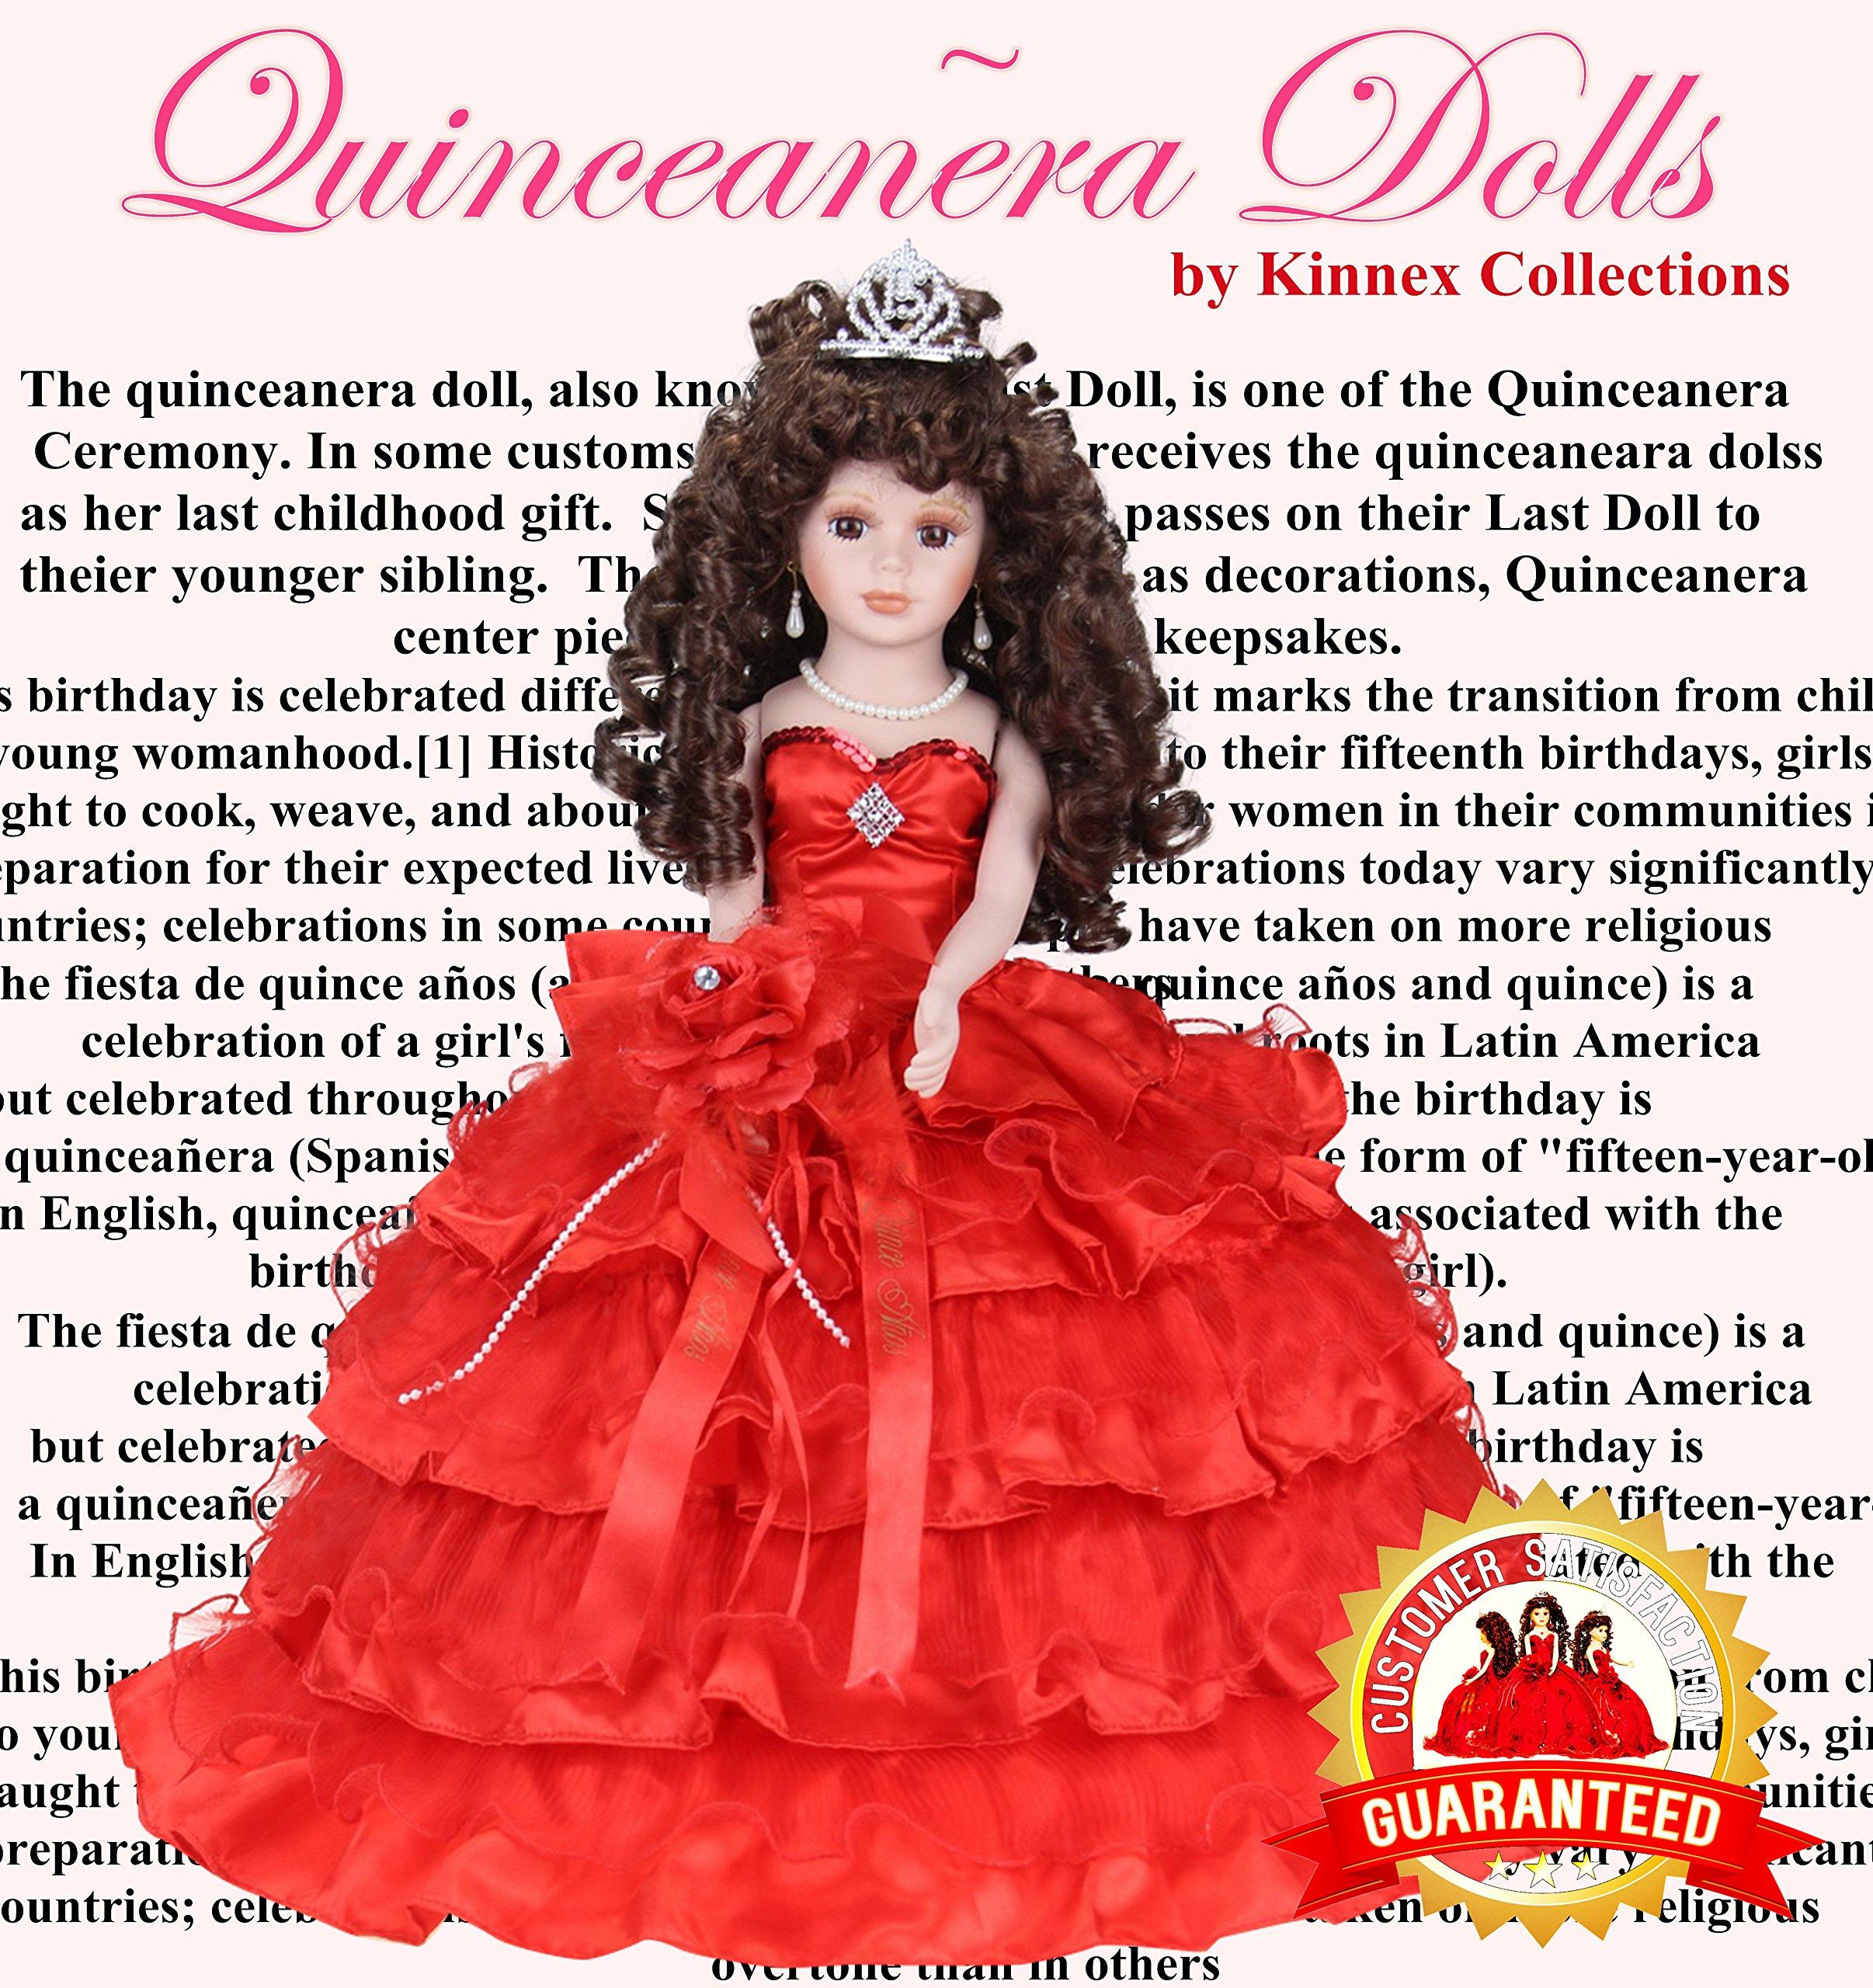 18'' Porcelain Quinceanera Umbrella Doll (Table Centerpiece)~ Red ~ KK18729-14